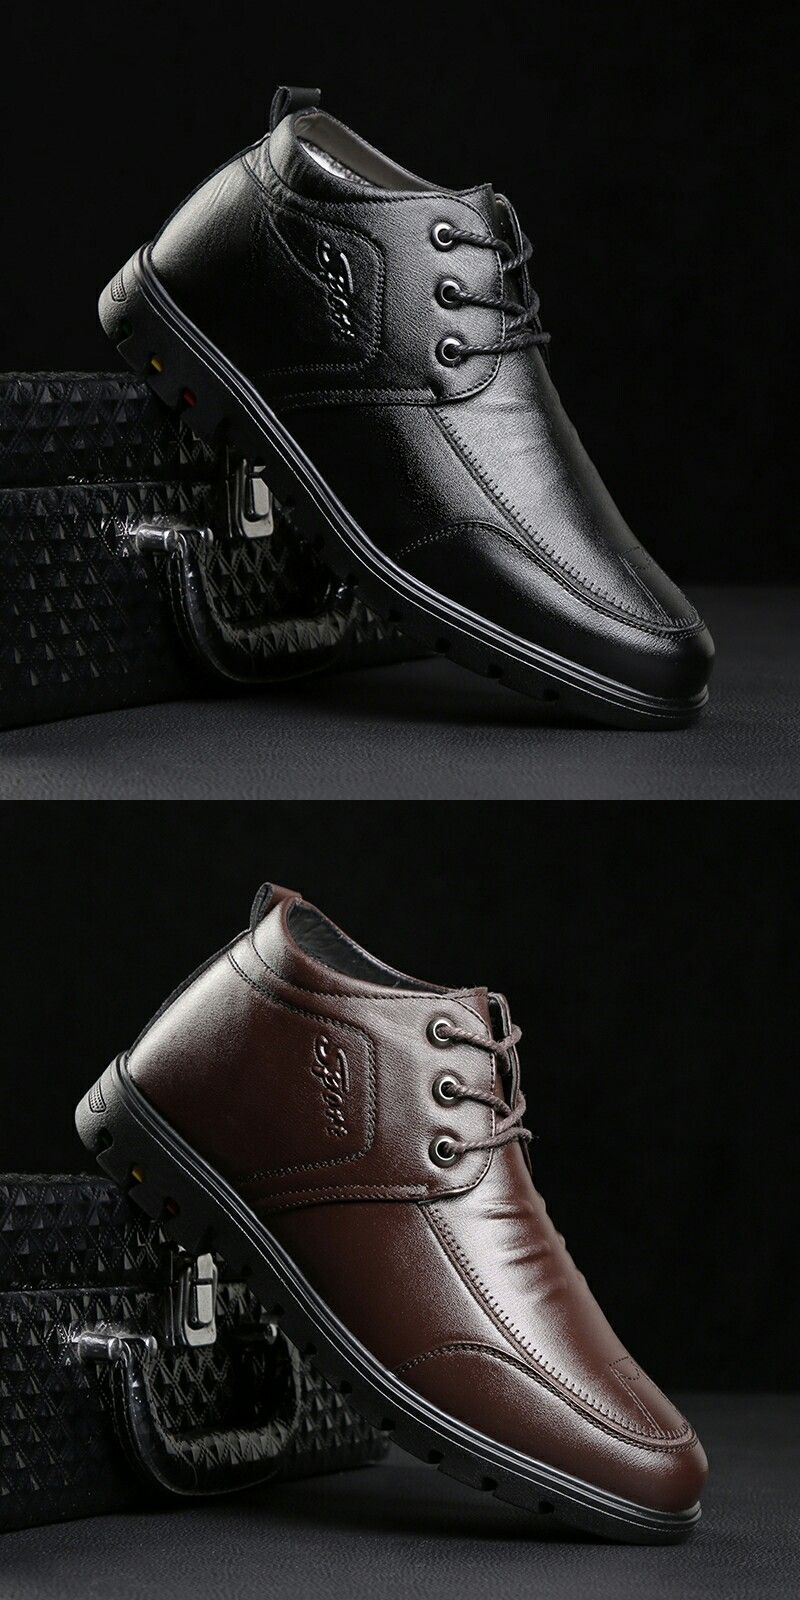 US $24.5 <Click to buy> Prelesty Office Men Dress Shoes